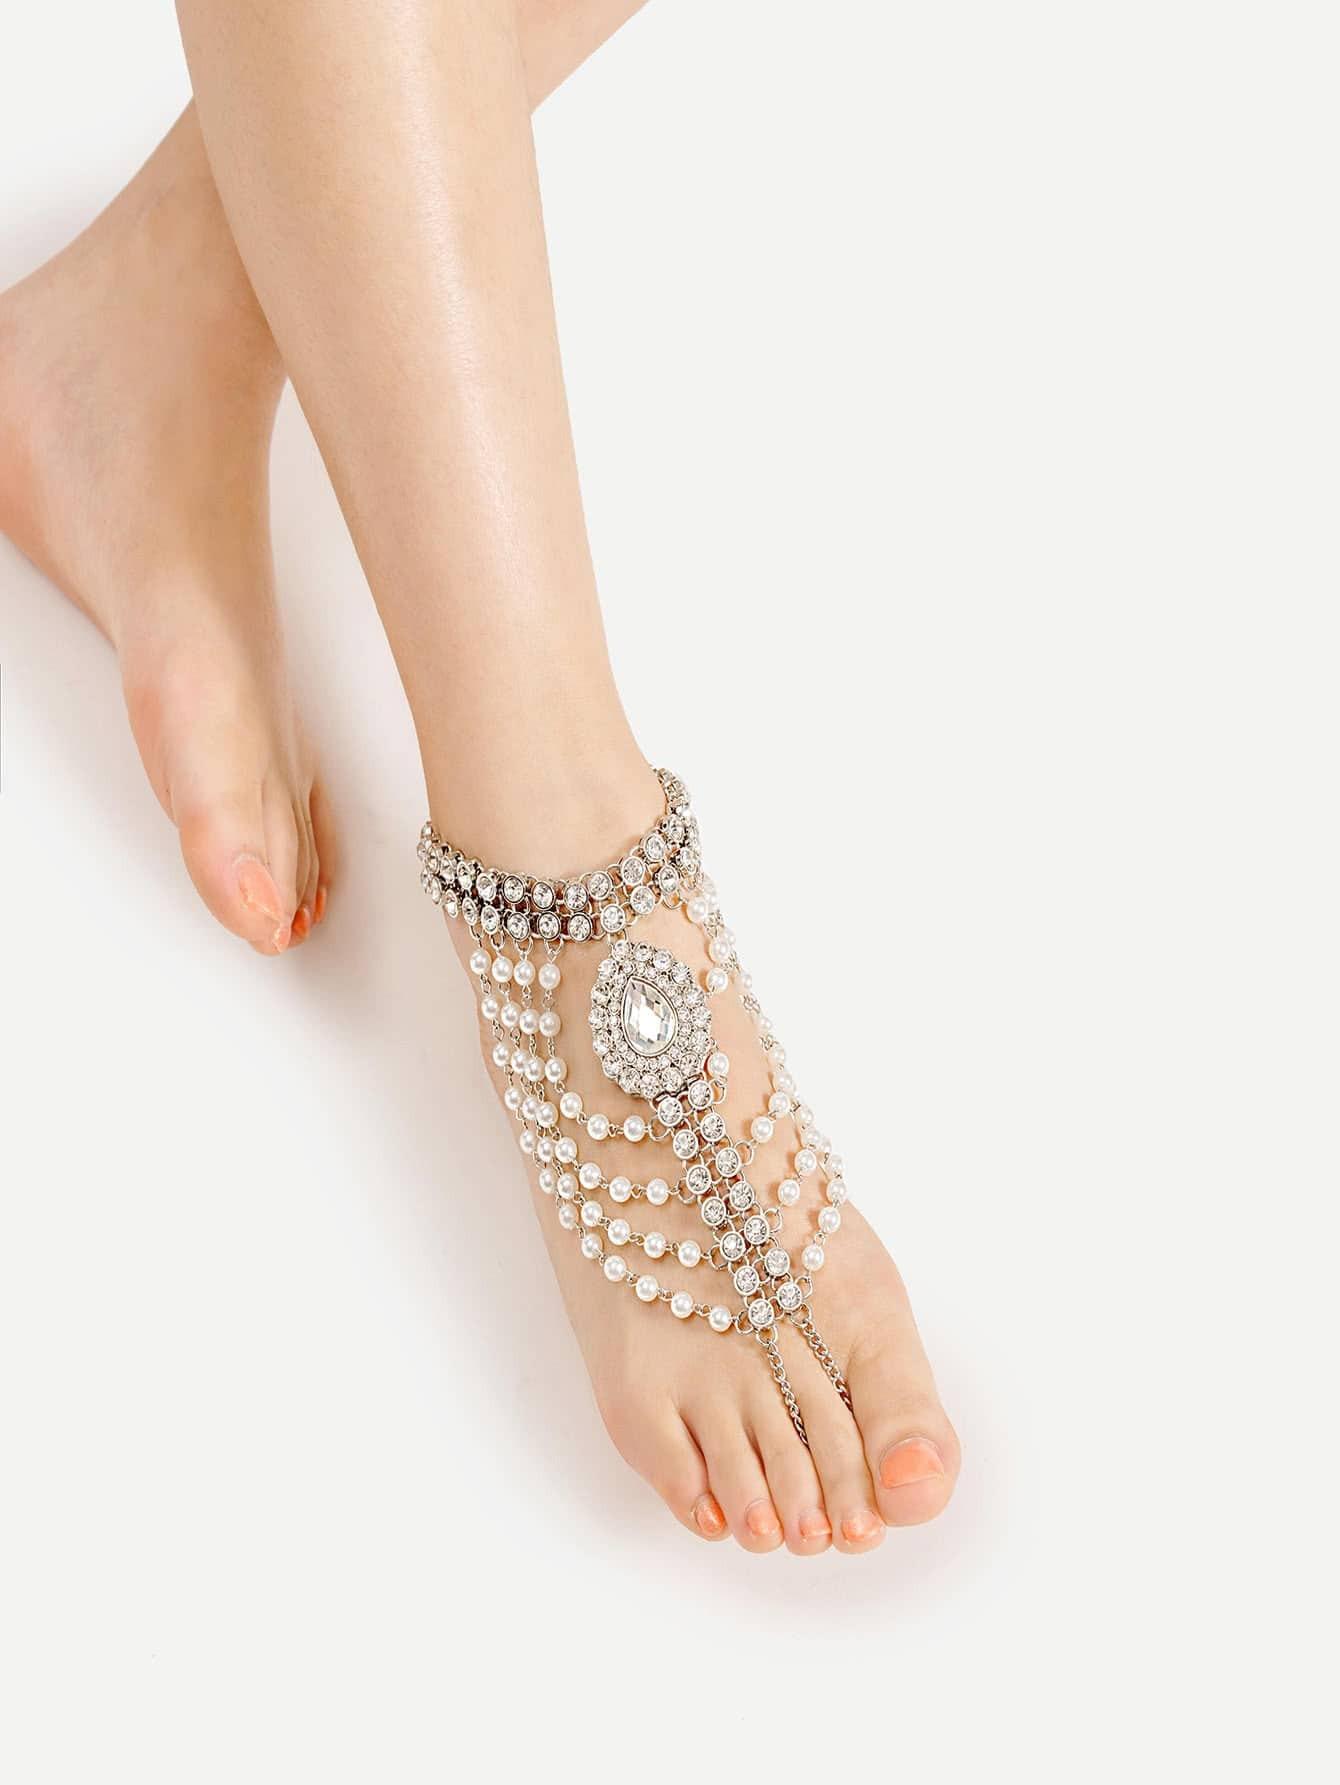 Фото Faux Pearl & Rhinestone Design Anklet With Toe Ring. Купить с доставкой